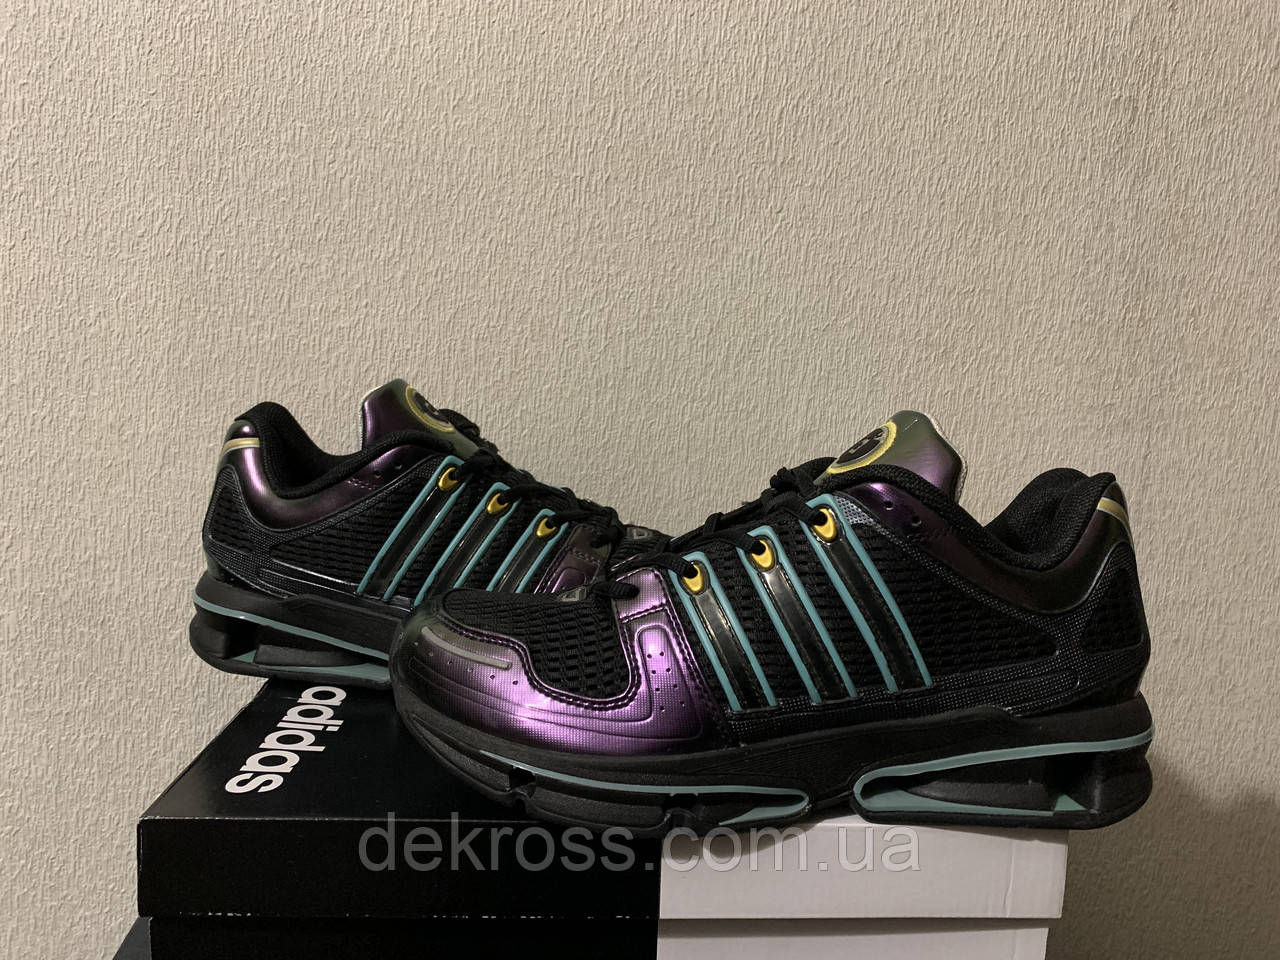 Кроссовки Adidas Tenis A3 TWINSTRIKE (42-43) Оригинал BA7235